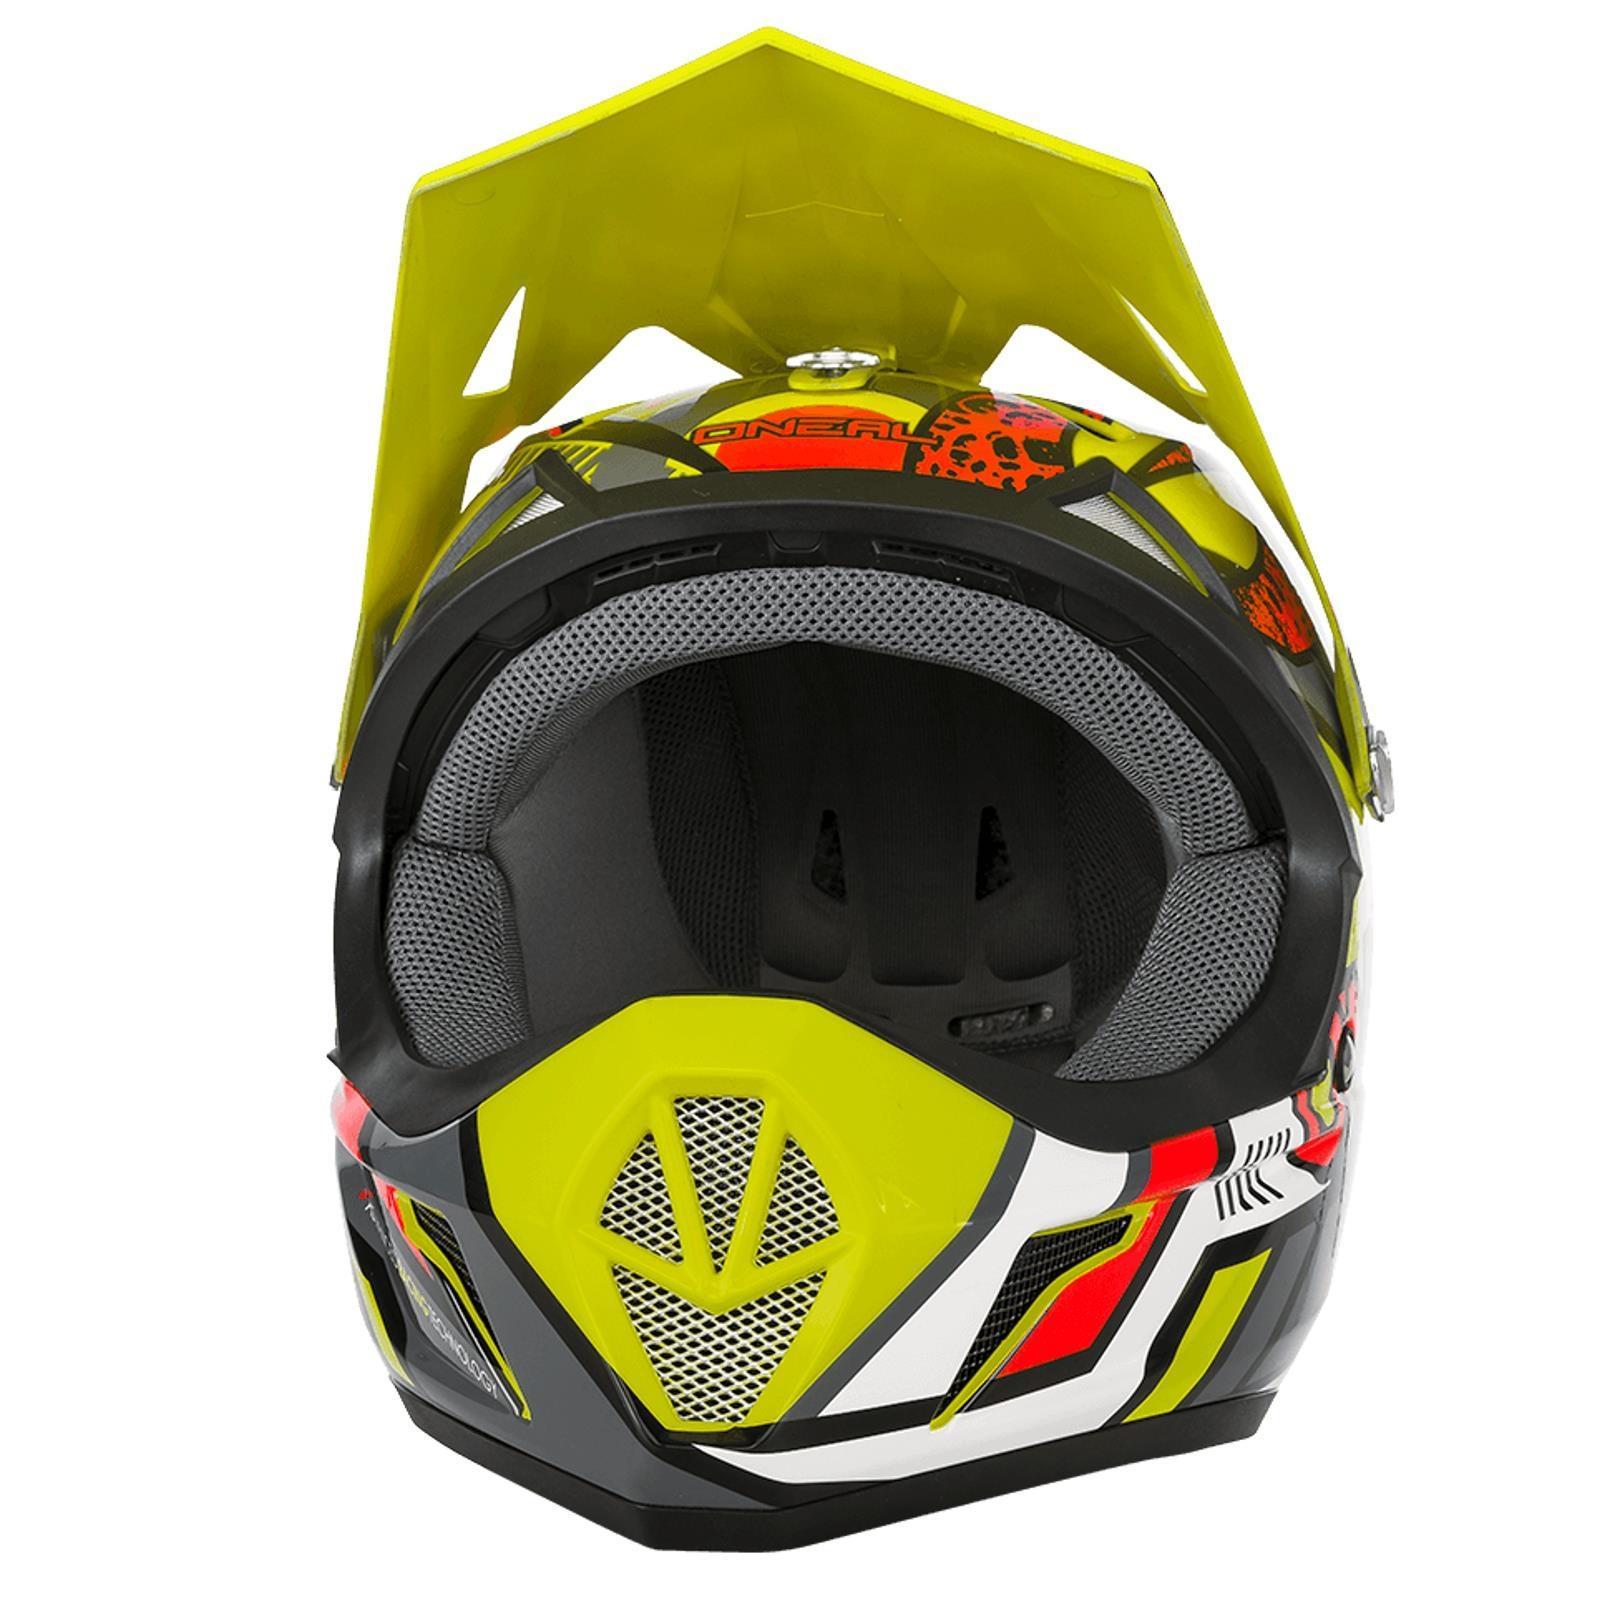 Indexbild 15 - ONeal-Sonus-Strike-Fahrrad-Helm-All-Mountain-Bike-MTB-Downhill-Fullface-Fidlock